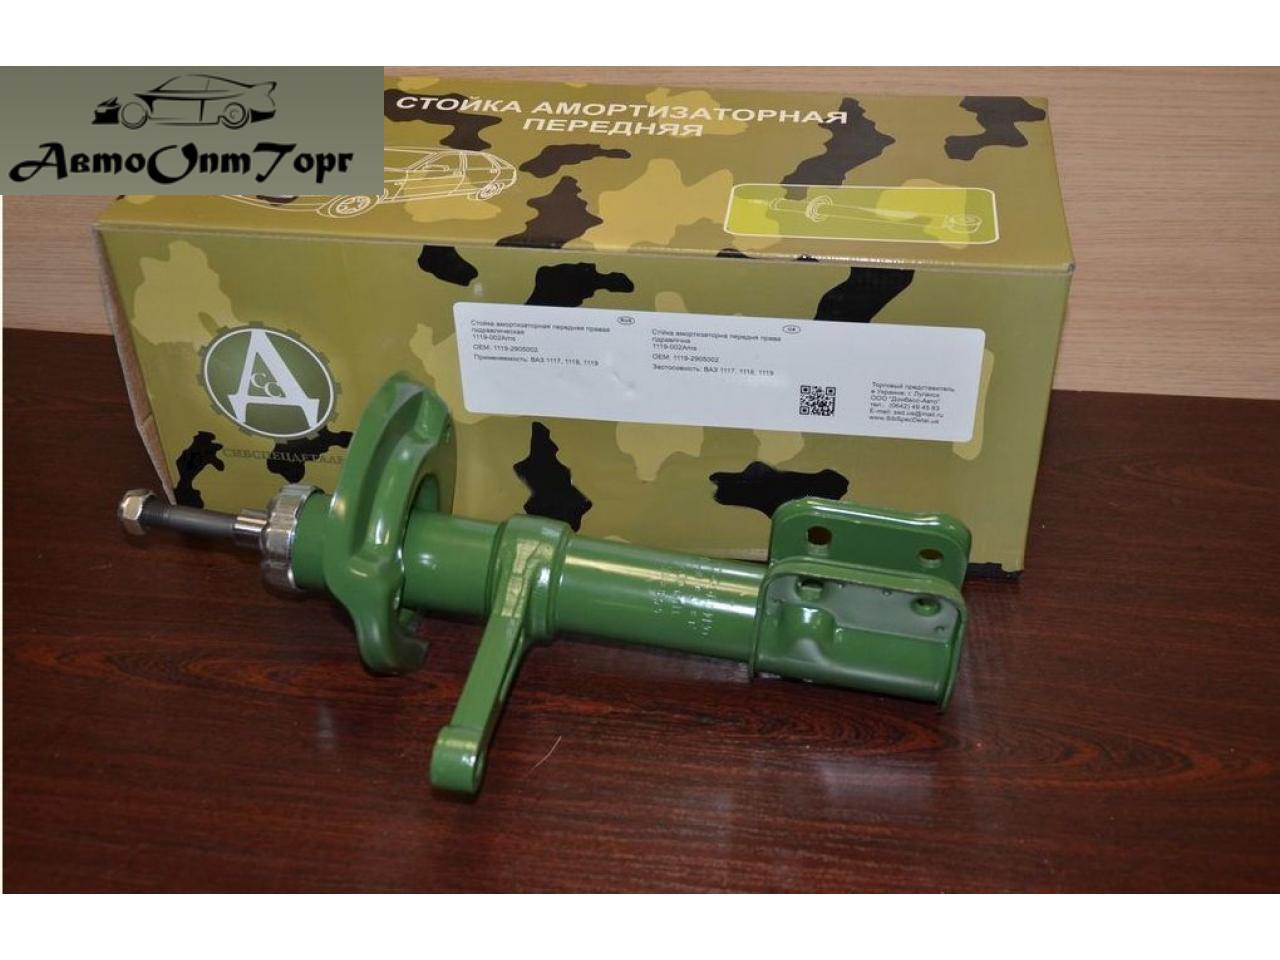 Амортизатор передний  правый ВАЗ Калина 1119, кат.код: 1119-2905002, прои-во: ССД 1119-002Ams